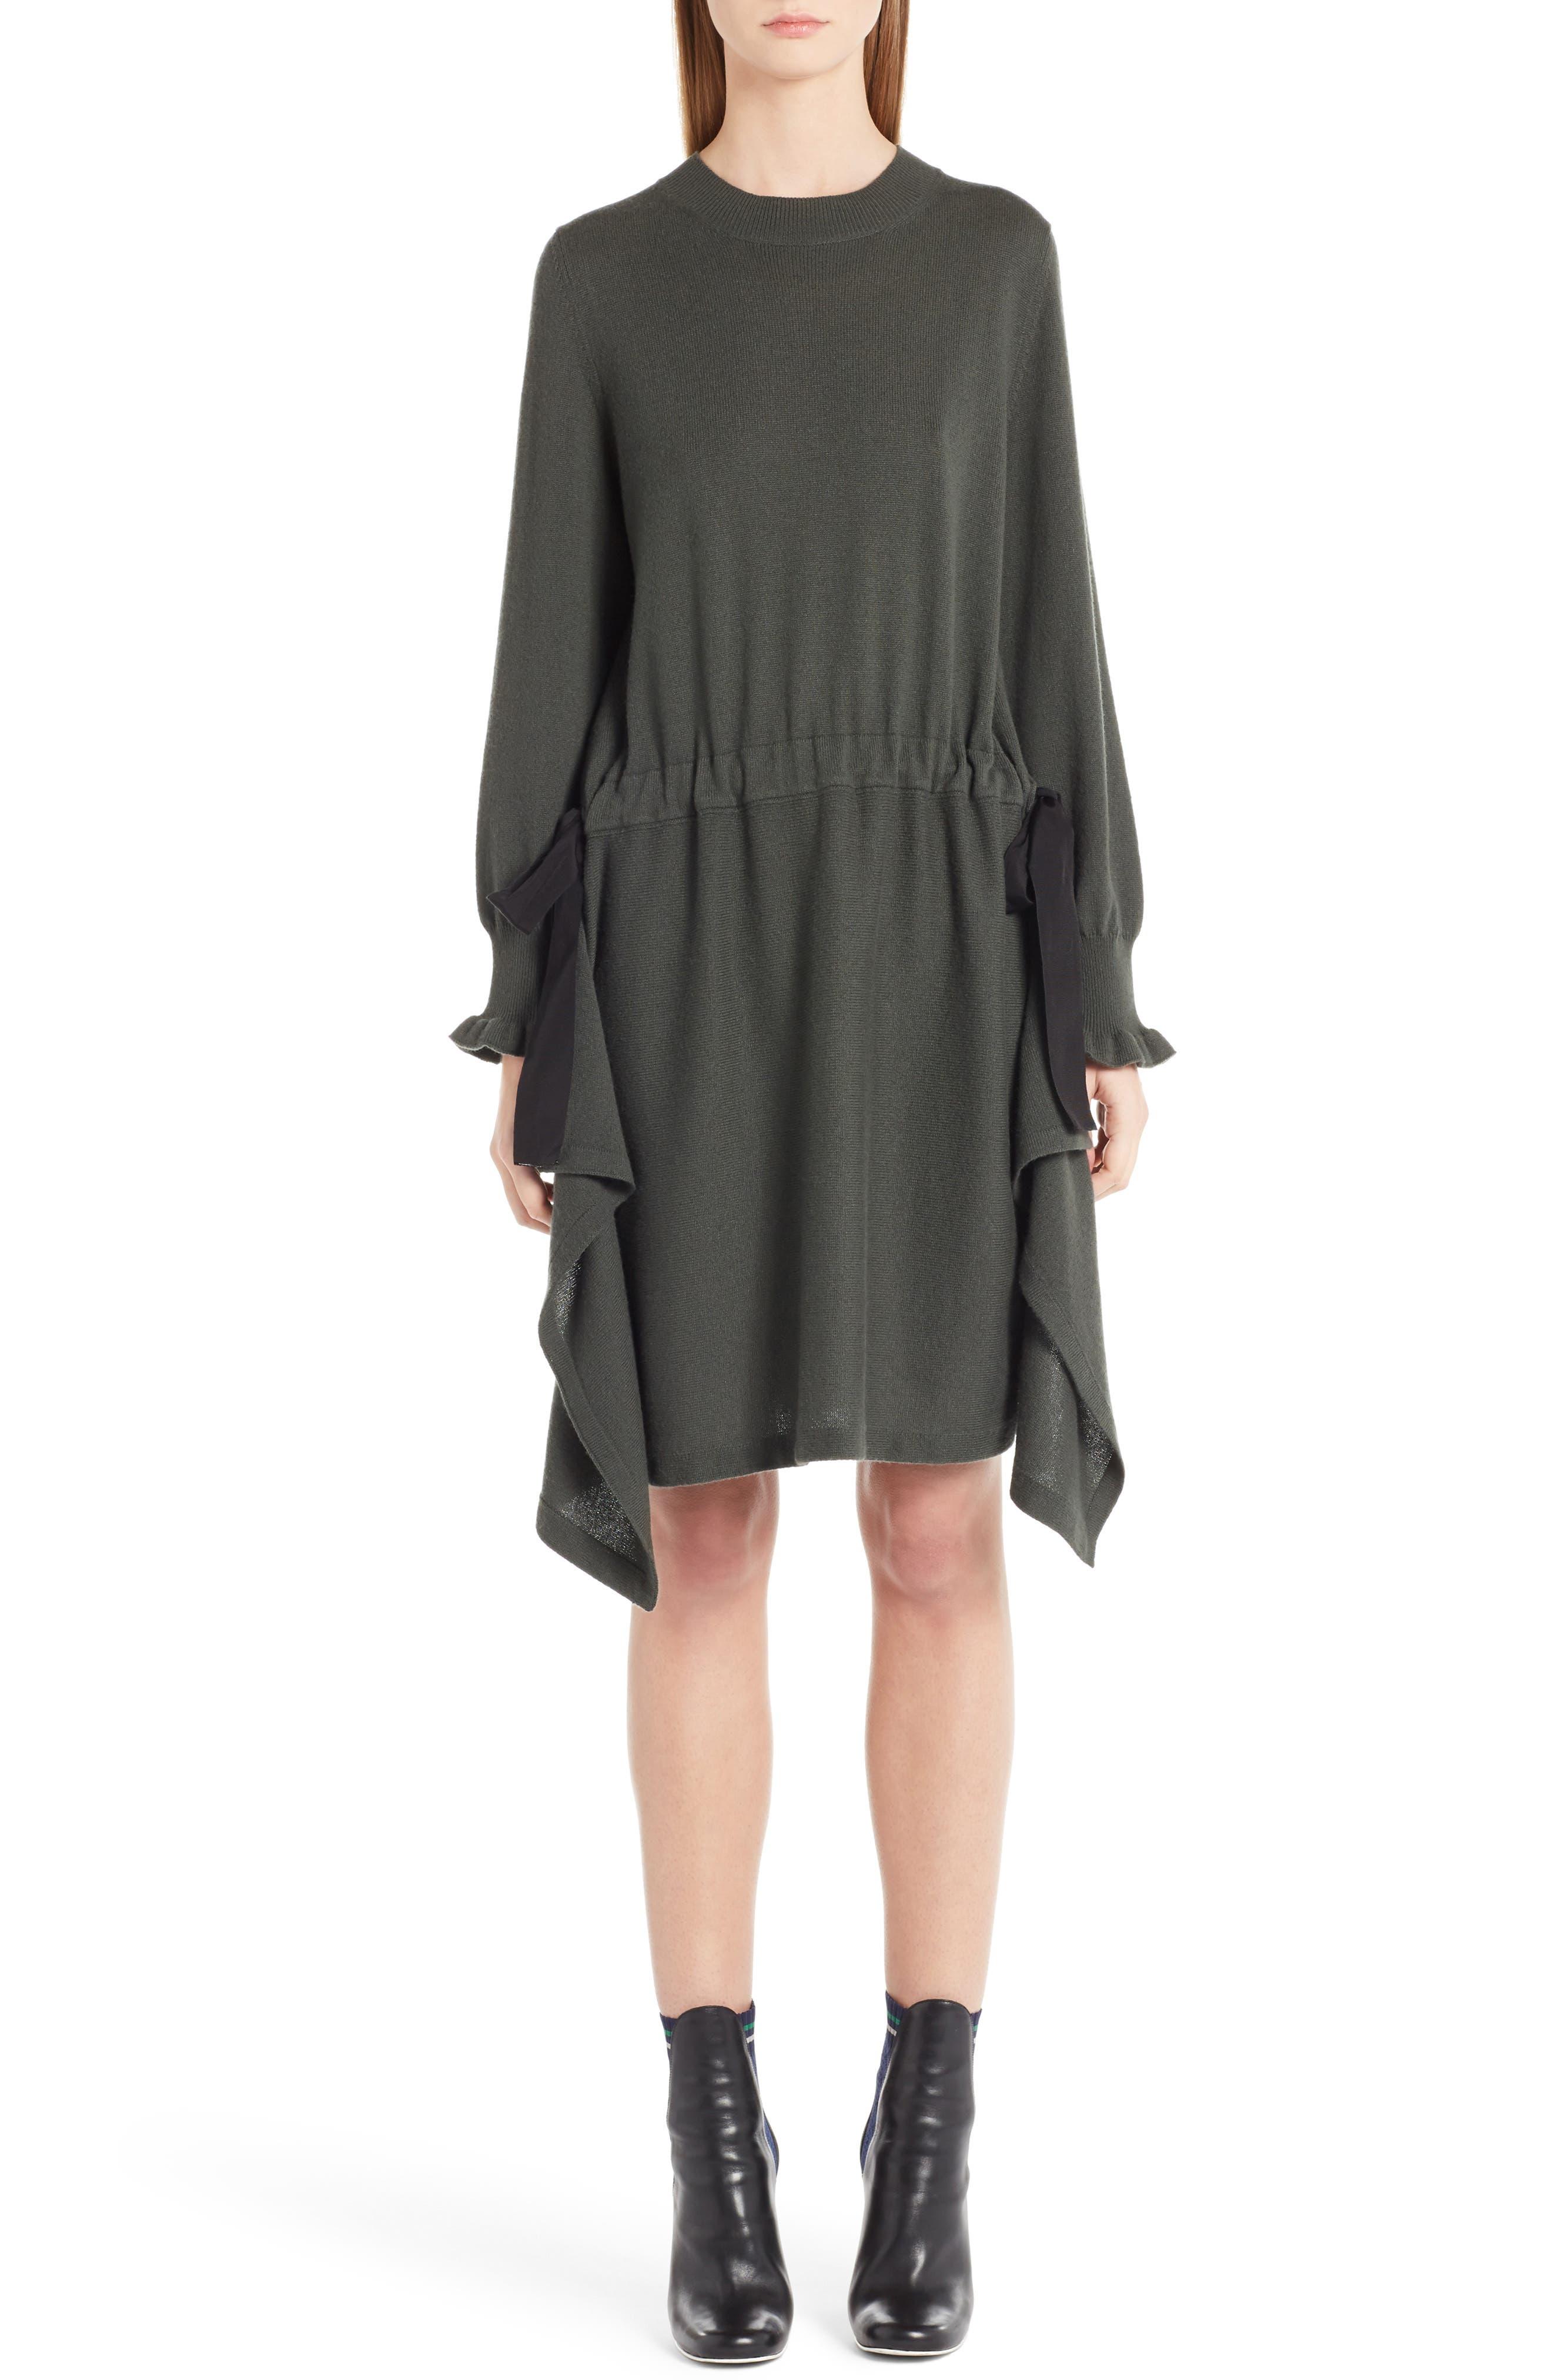 Fendi Cashmere Cascade Cashmere Knit Dress